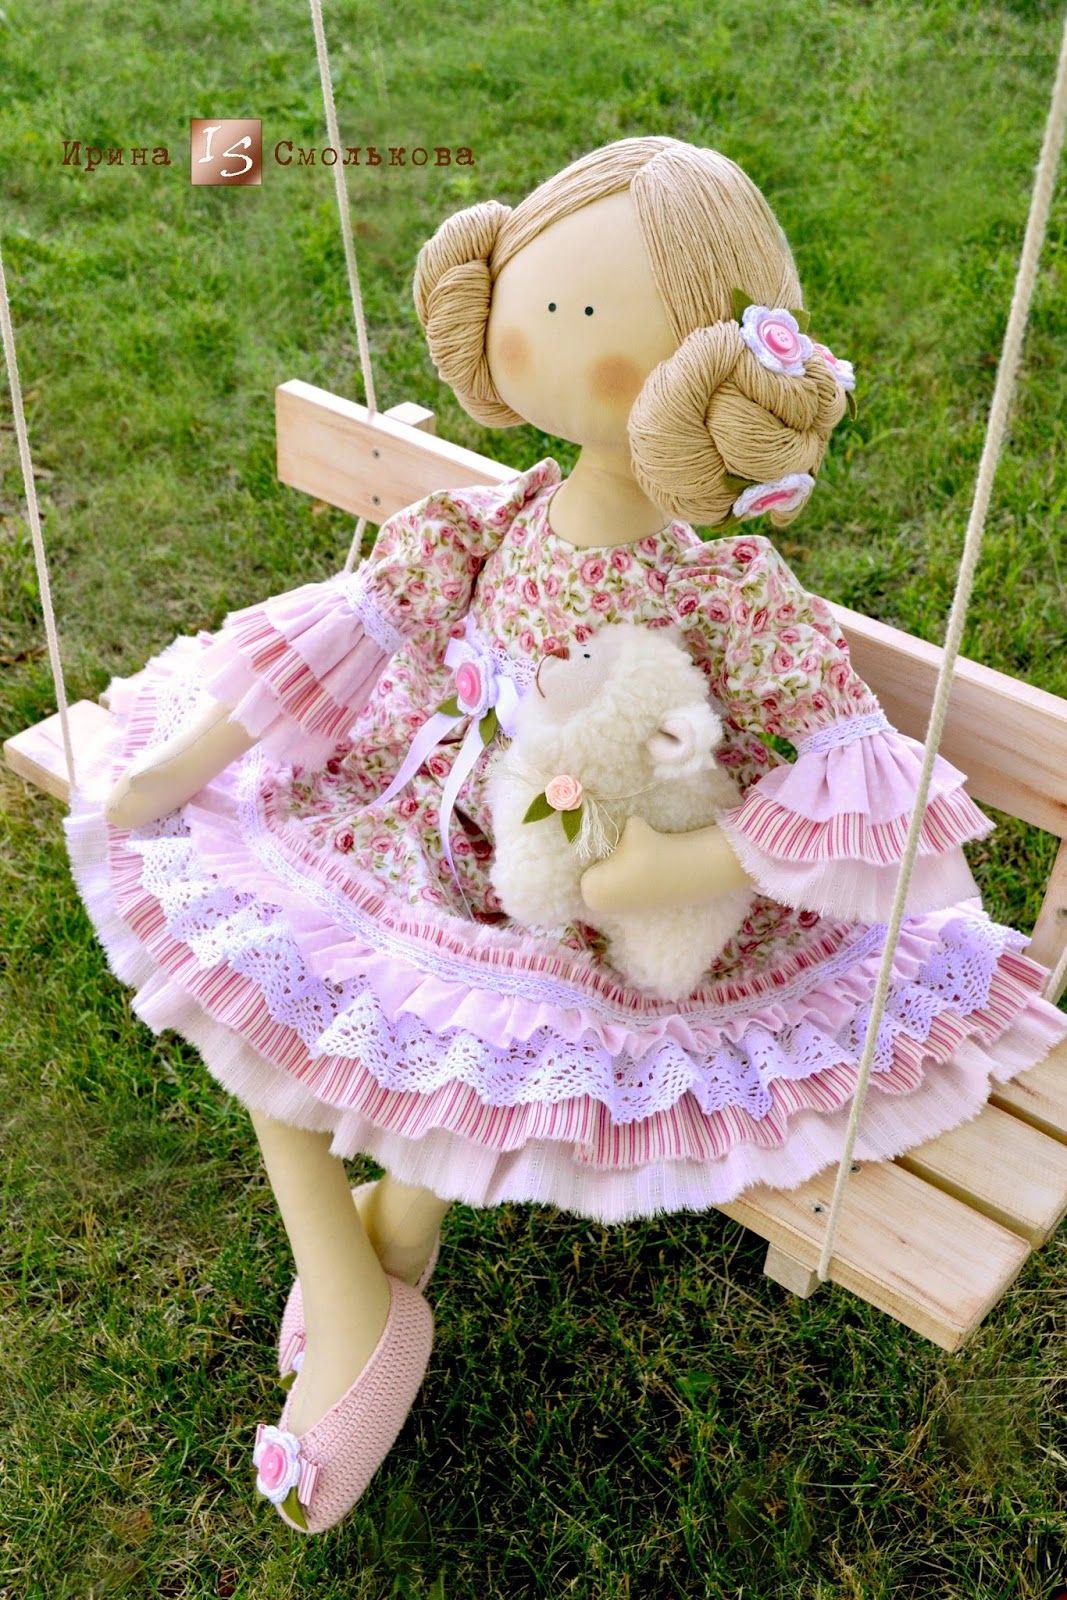 Сказочный Домик: Кукла на заказ what wonderful dolls i want one